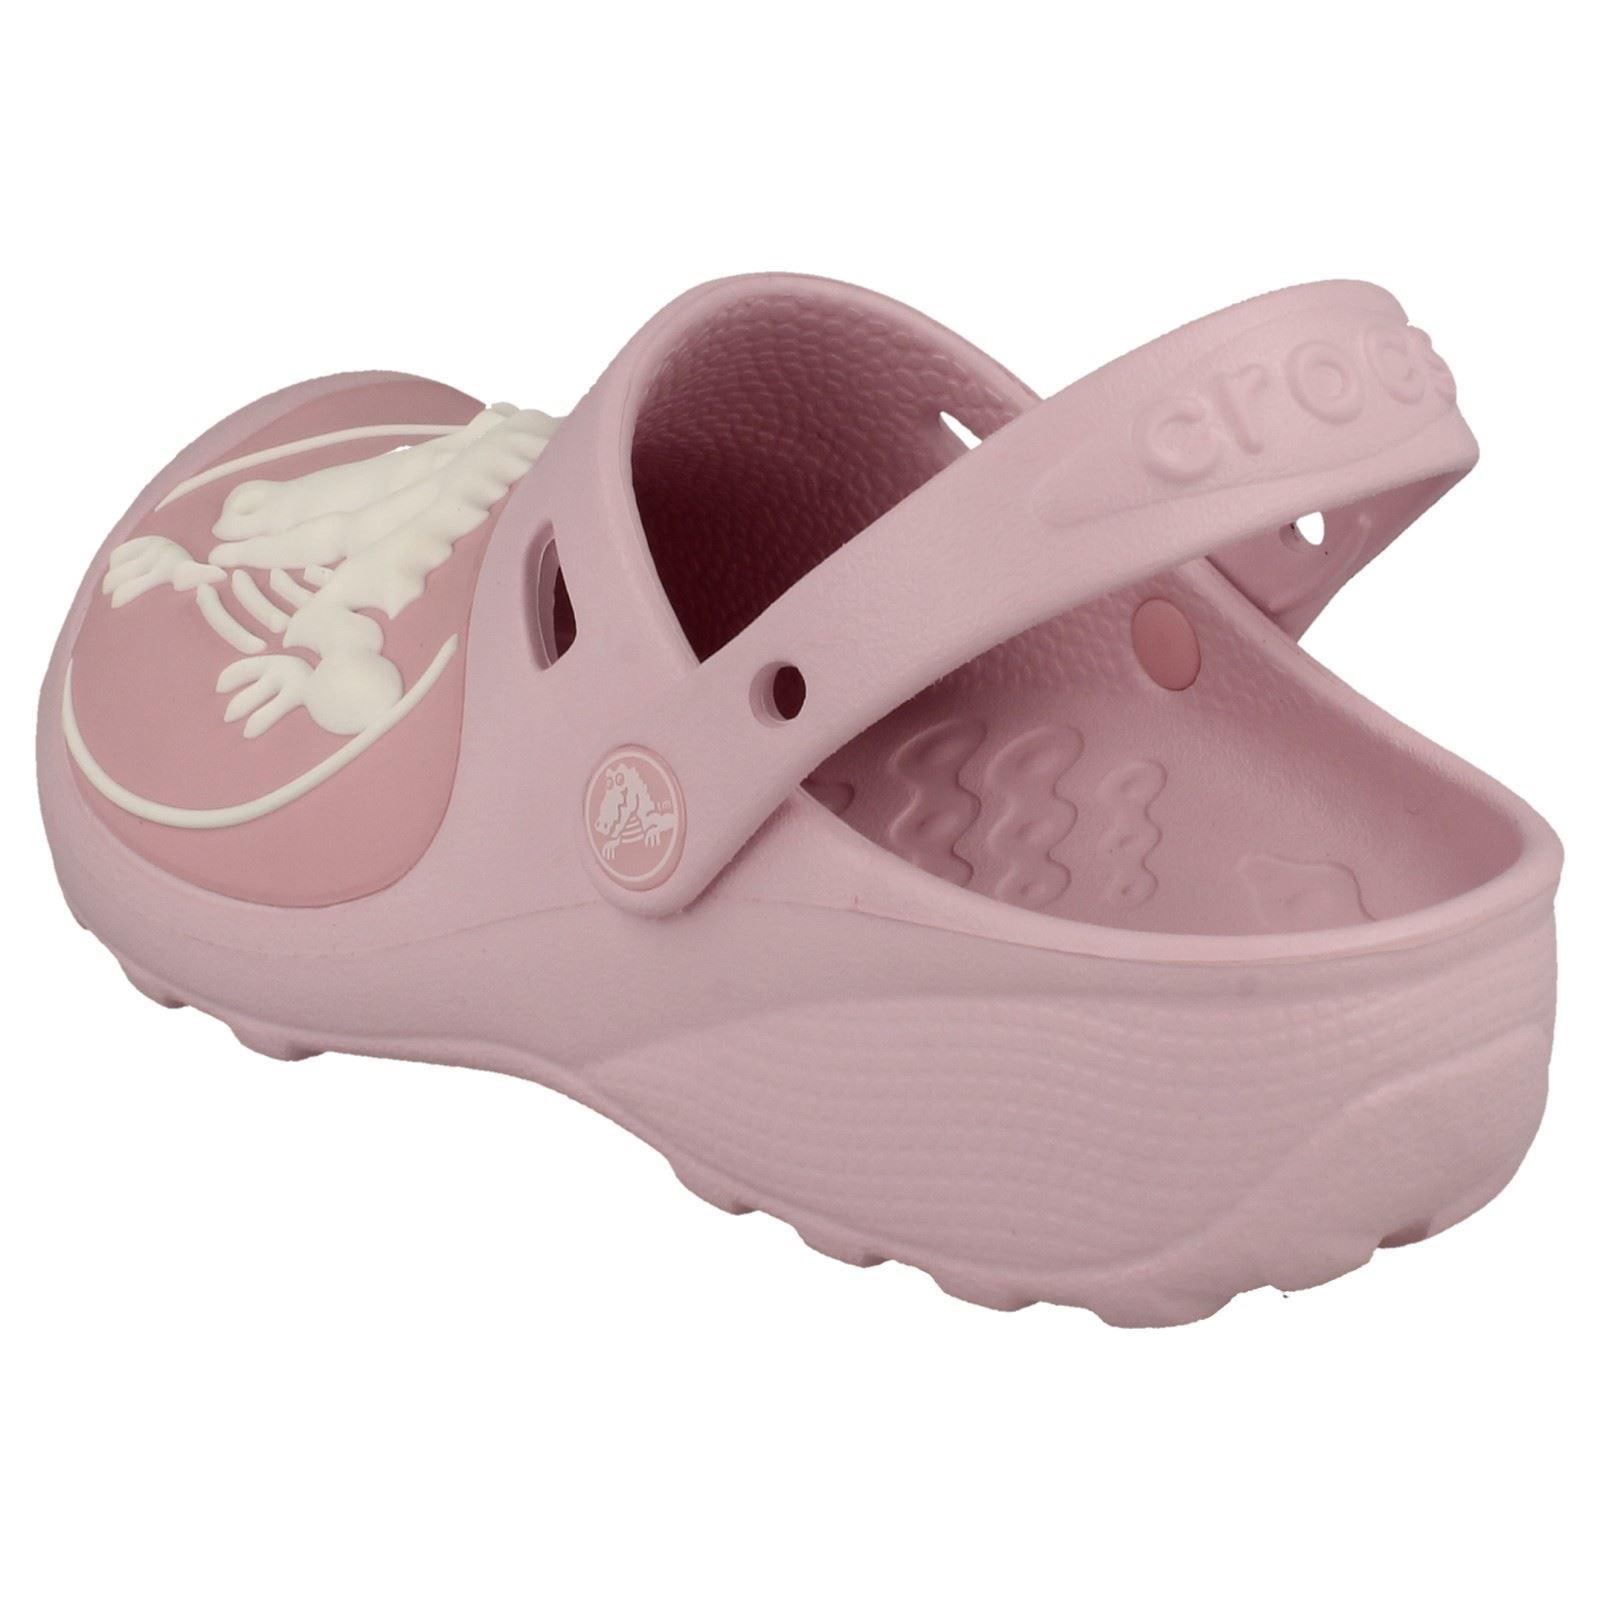 Girls Crocs, Slip On Summer Clogs 'Gabe' The Style ~ K